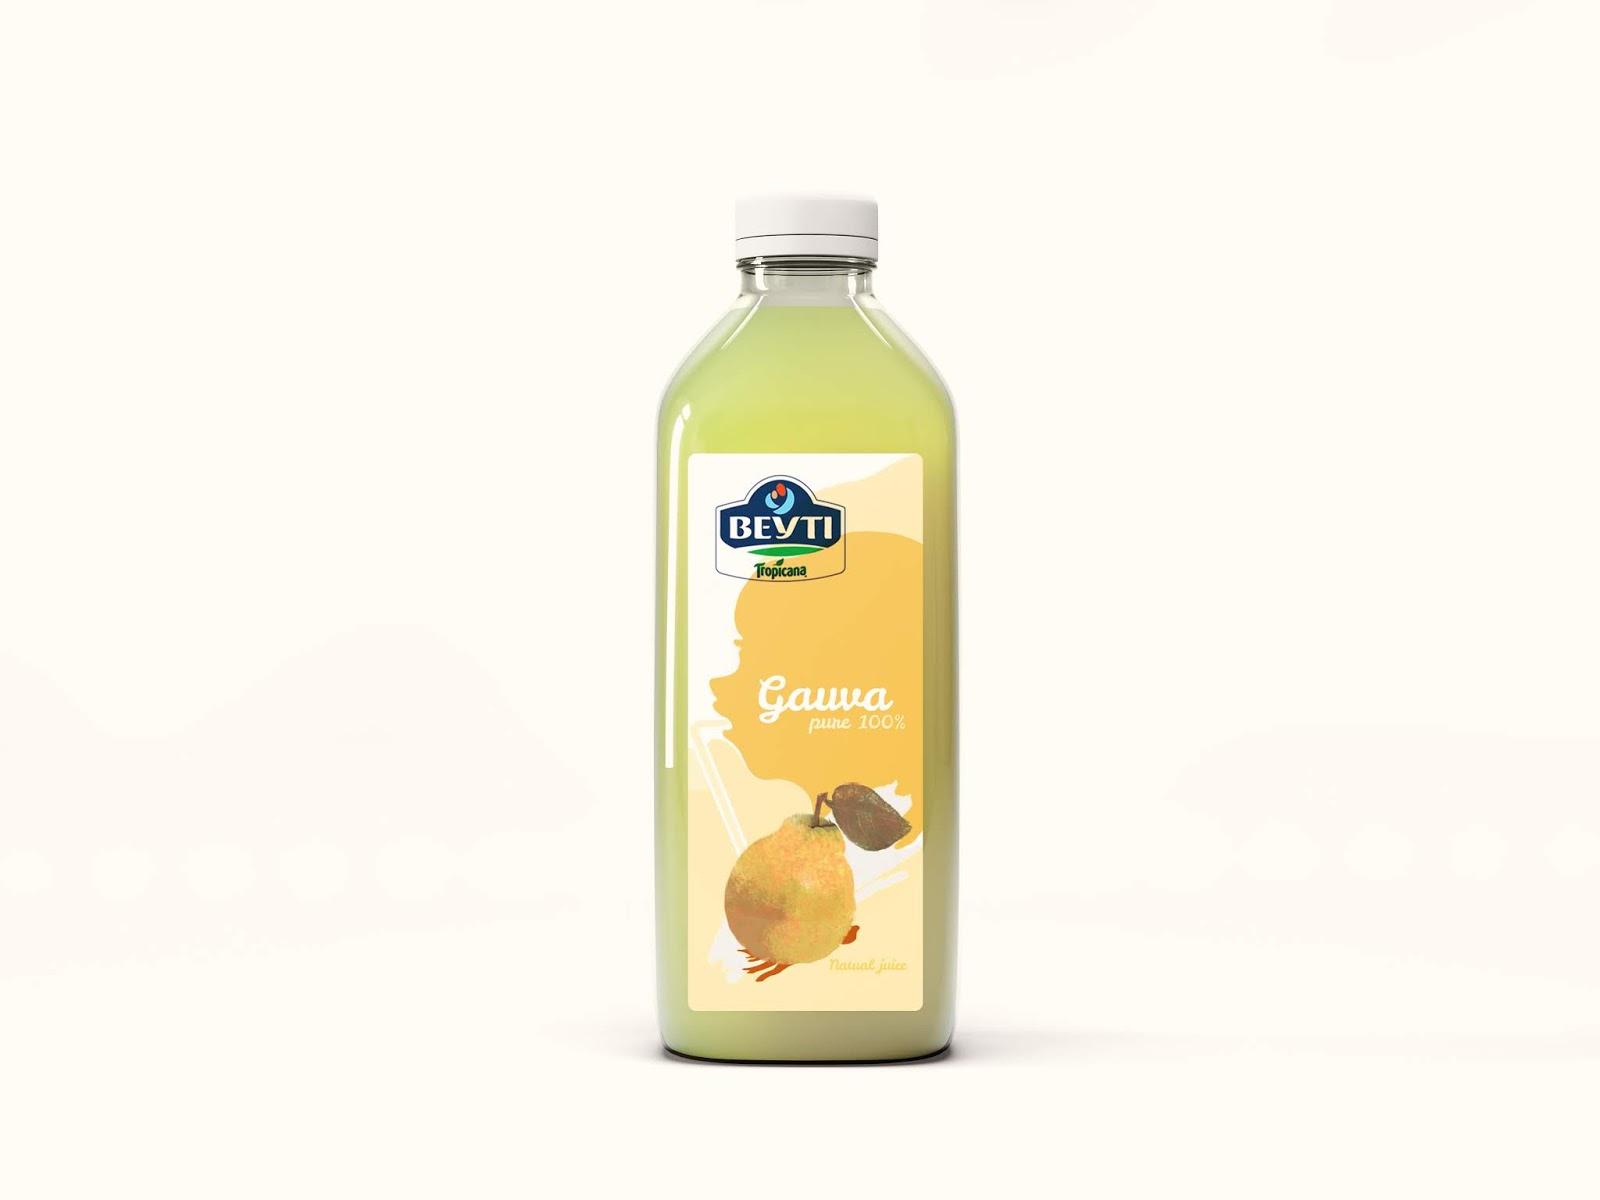 BEYTI果汁包装设计